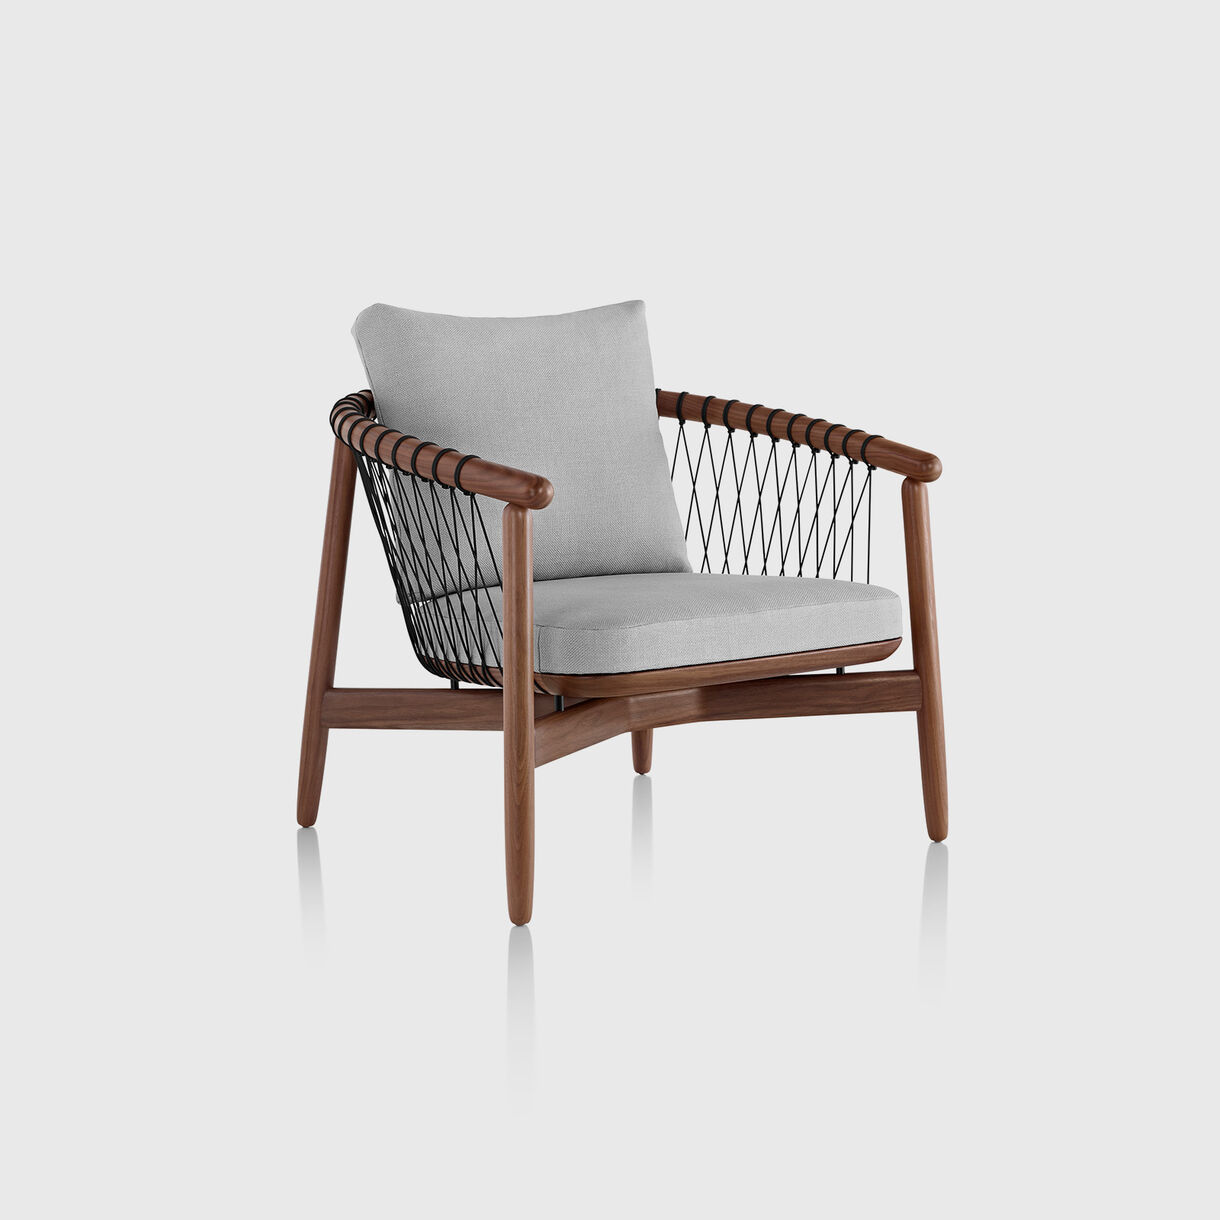 Crosshatch Lounge Chair, Walnut & Gray Wool Epingle